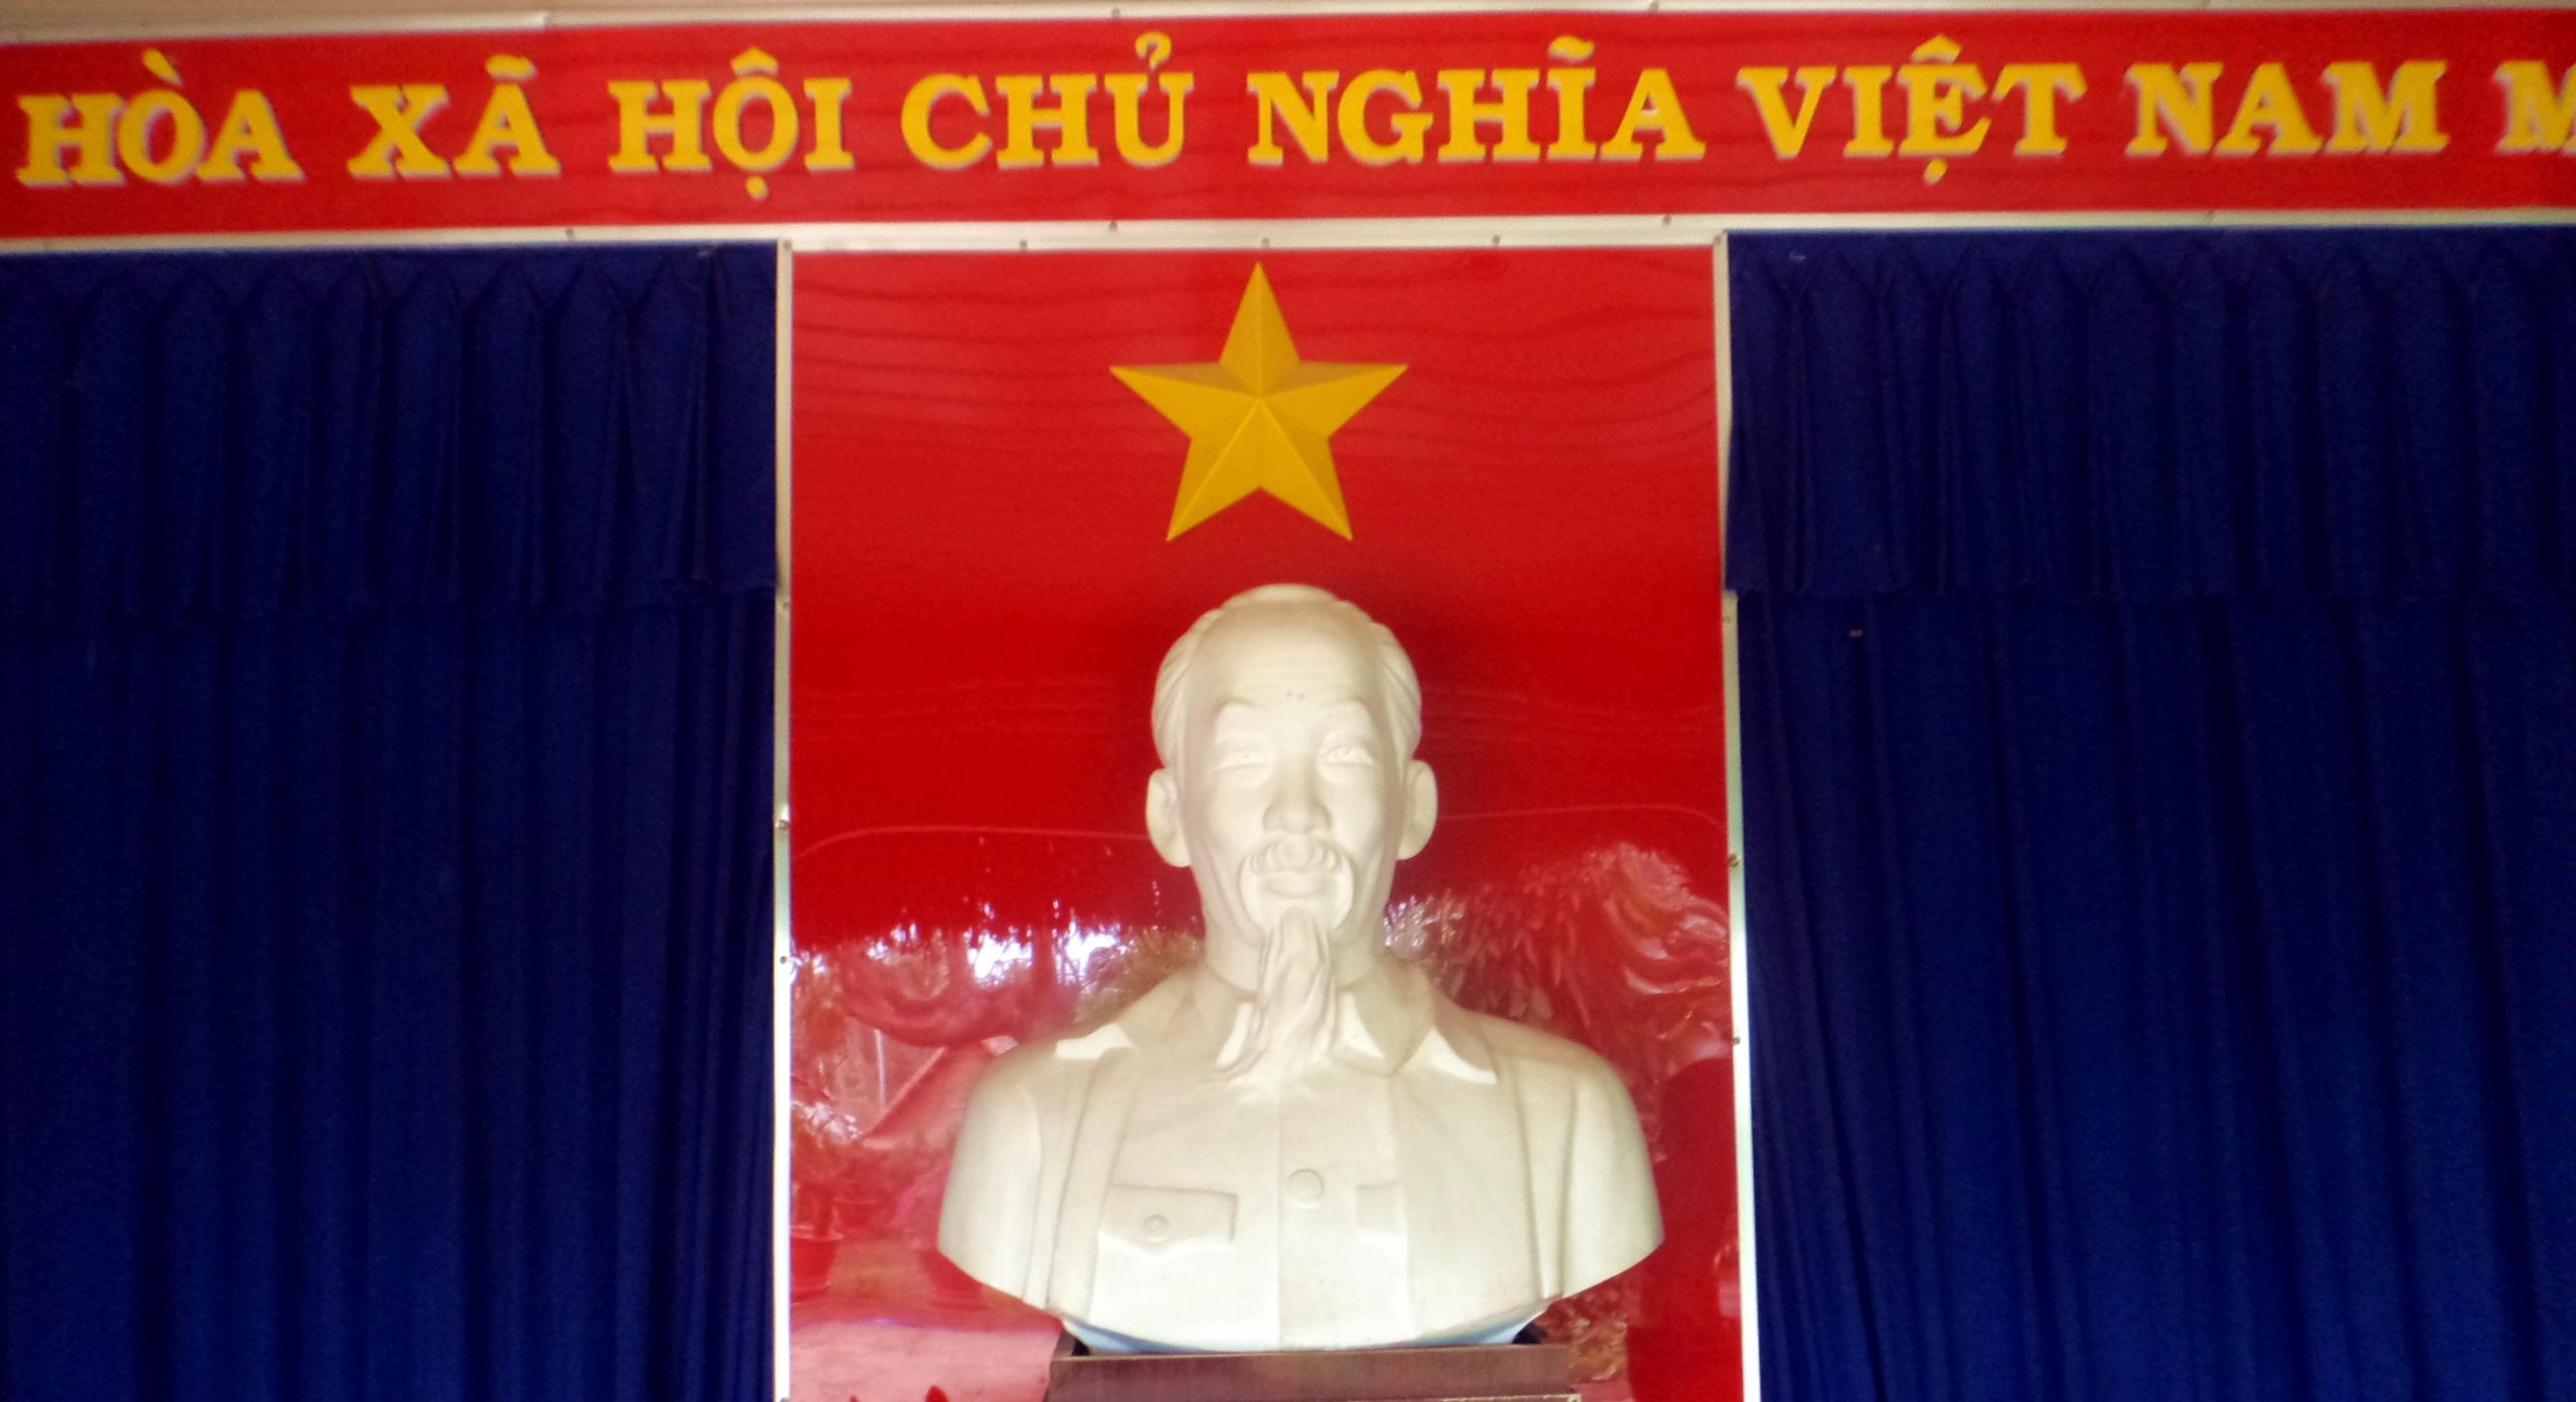 hochiminhcity_vietna_cuchi_1